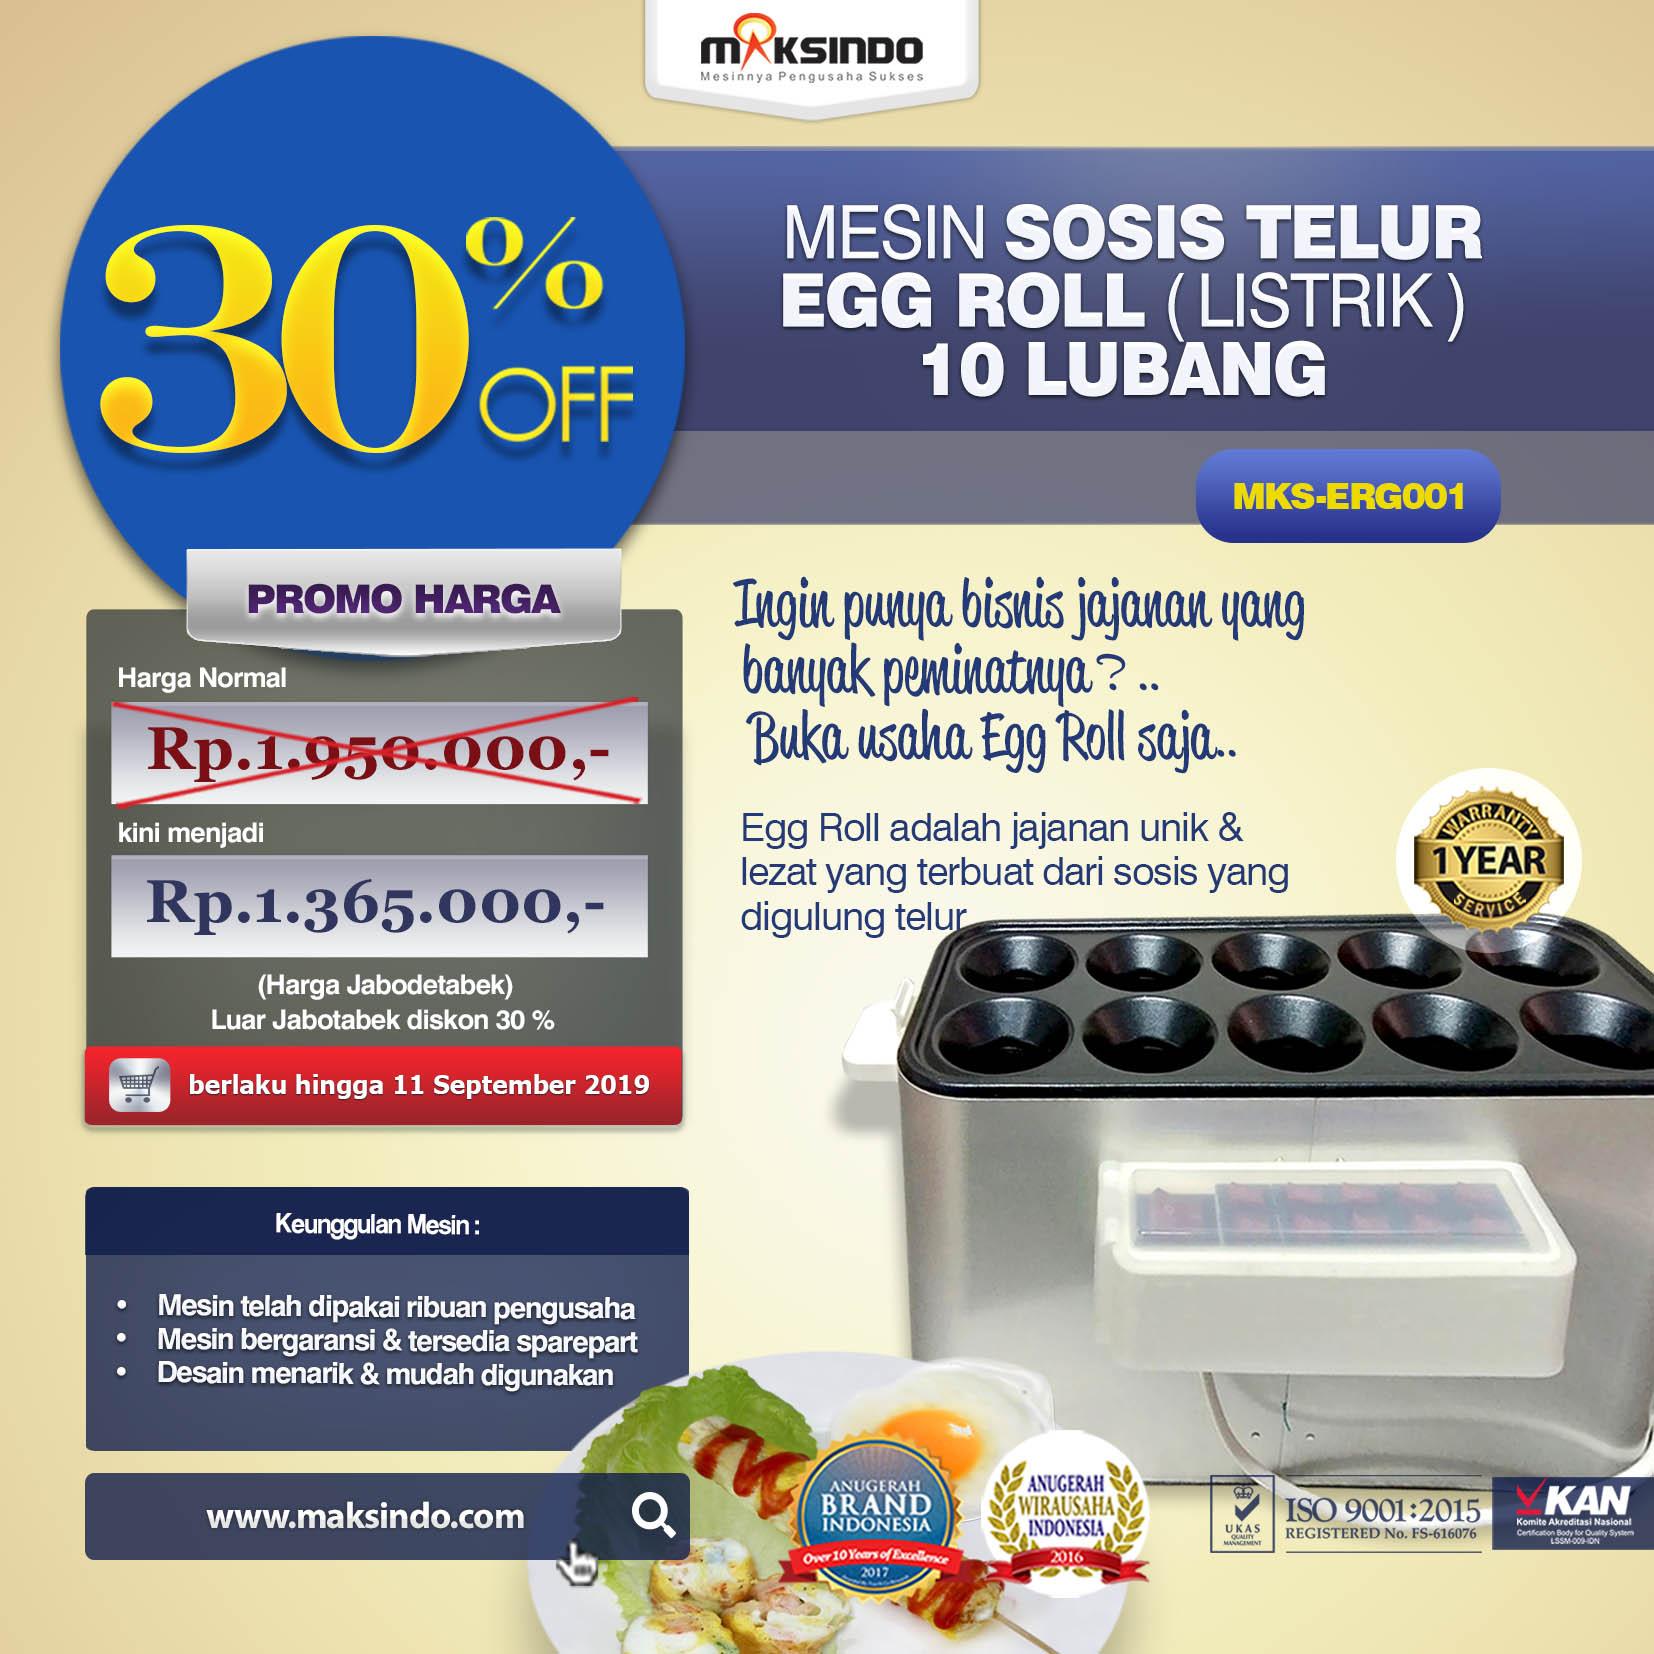 MKS-ERG001 Mesin Pembuat Egg Roll (Listrik)